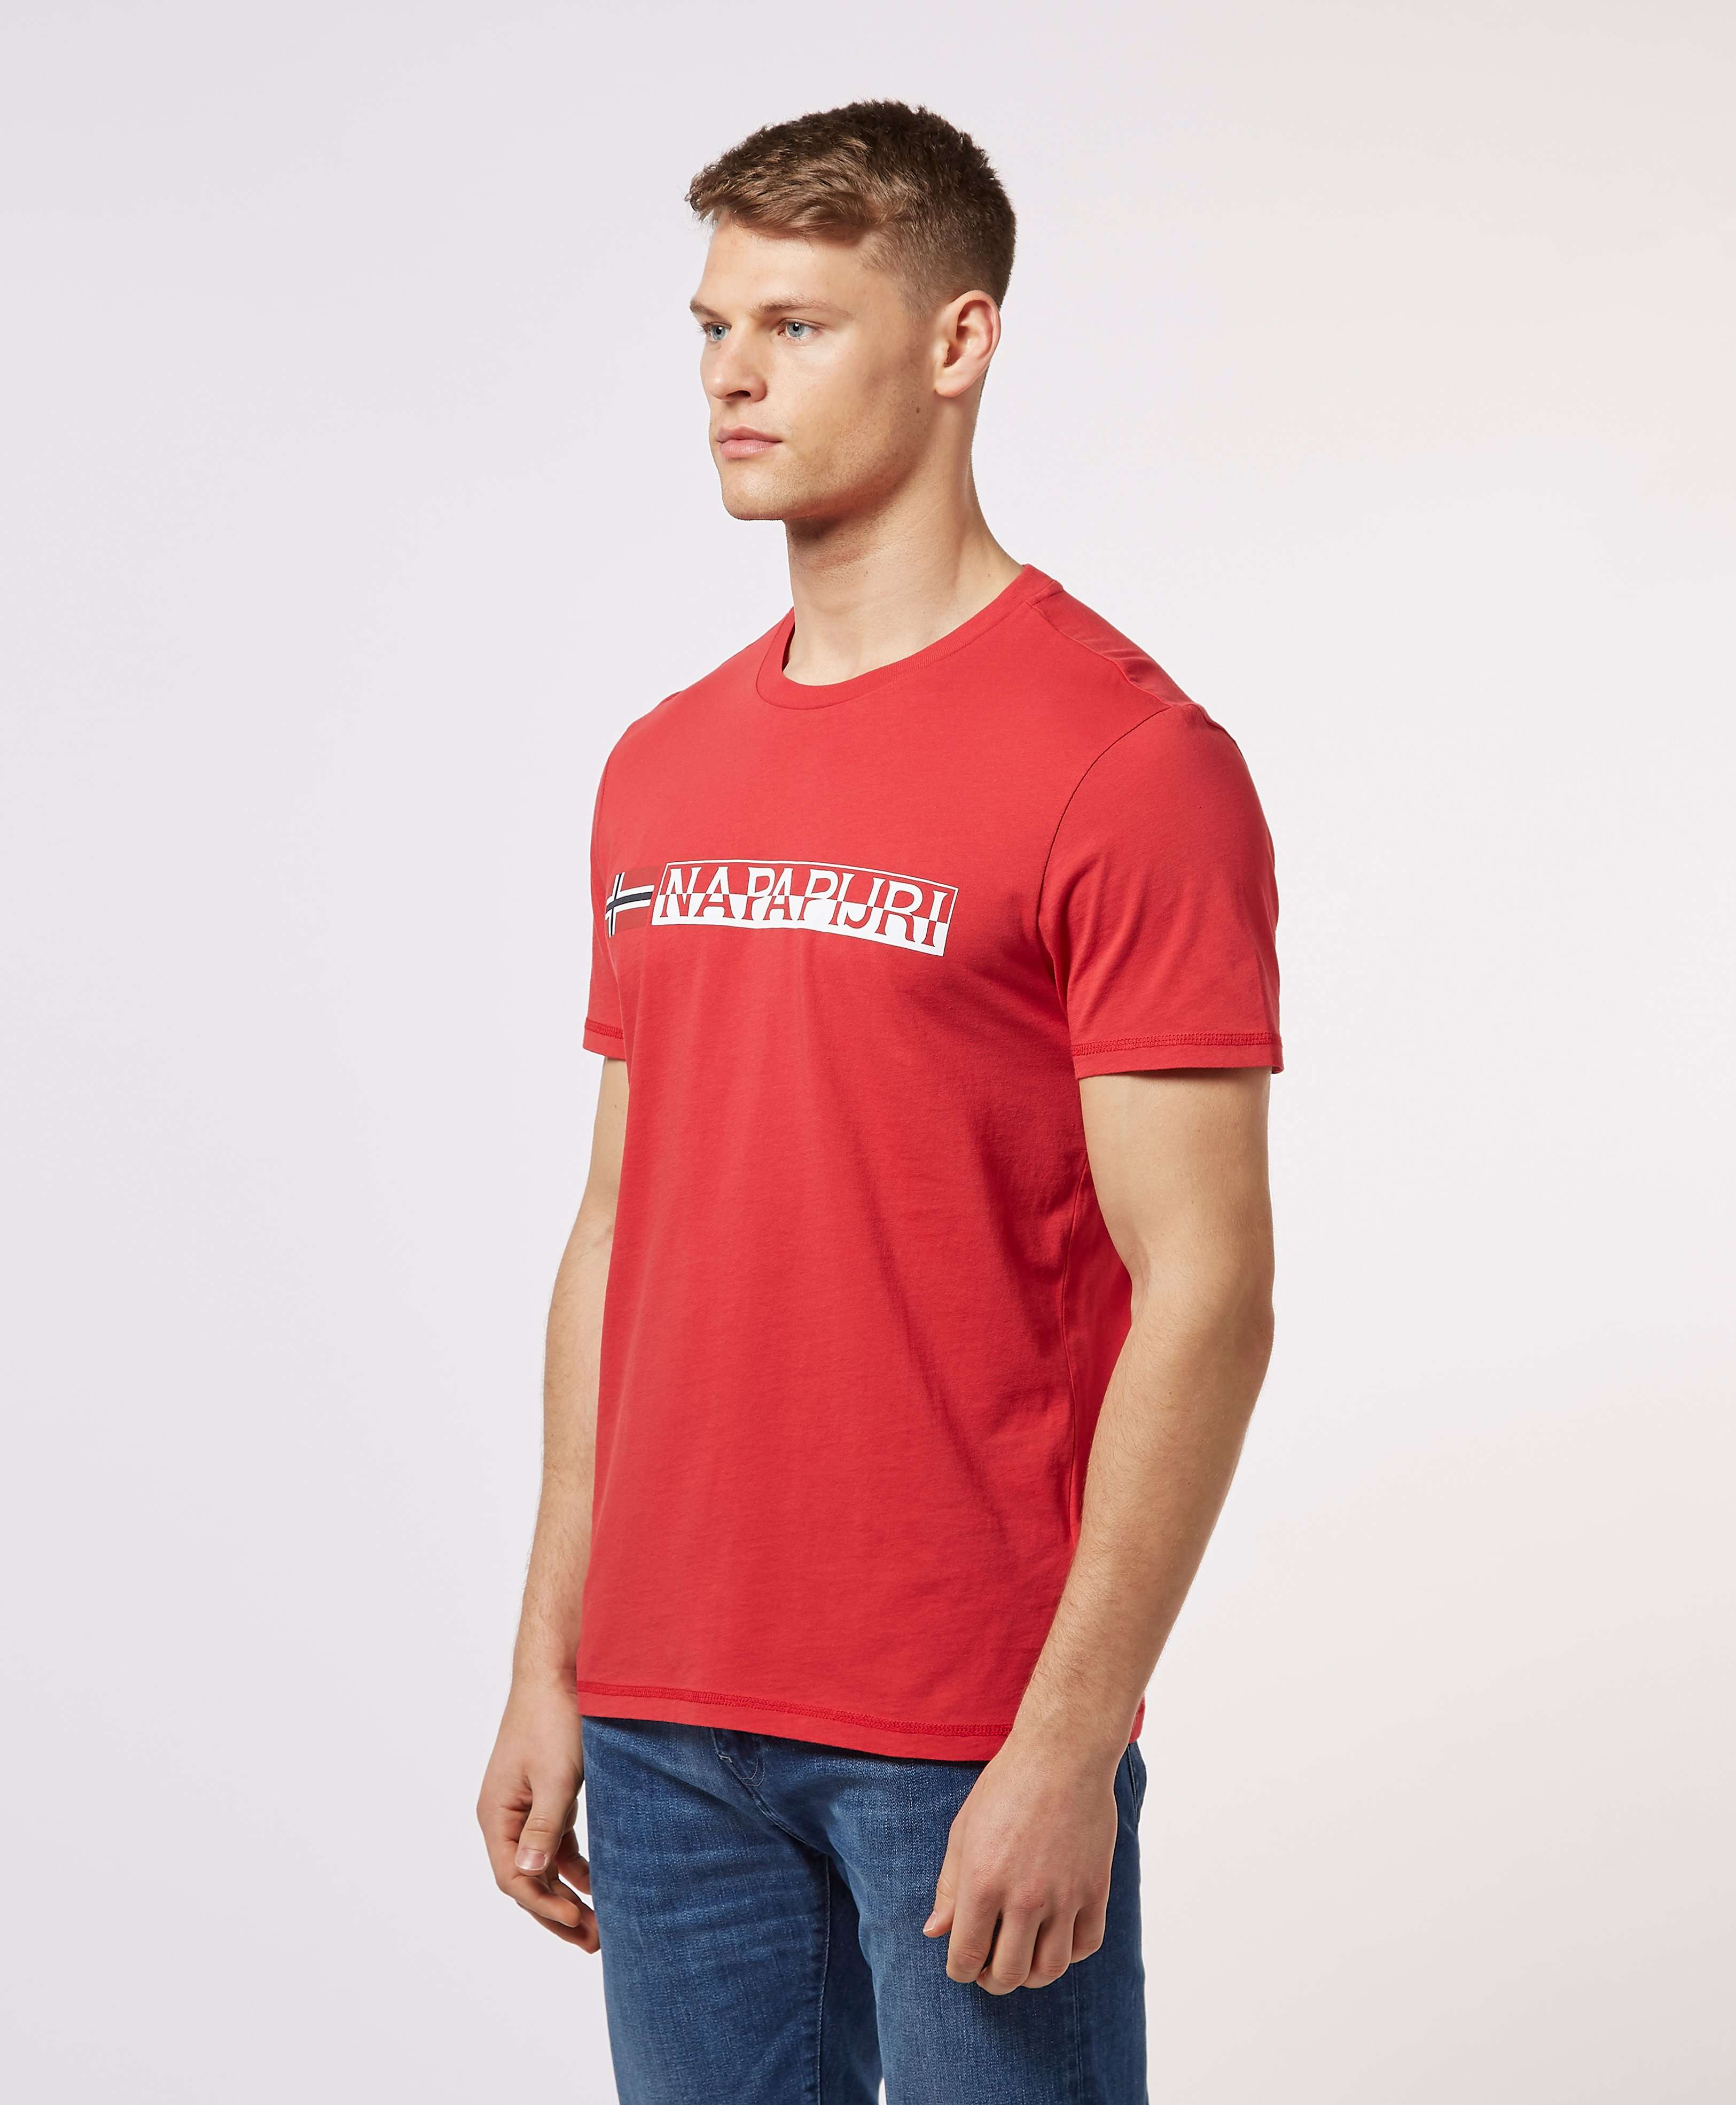 Napapijri Short Sleeve Logo T-Shirt - Exclusive